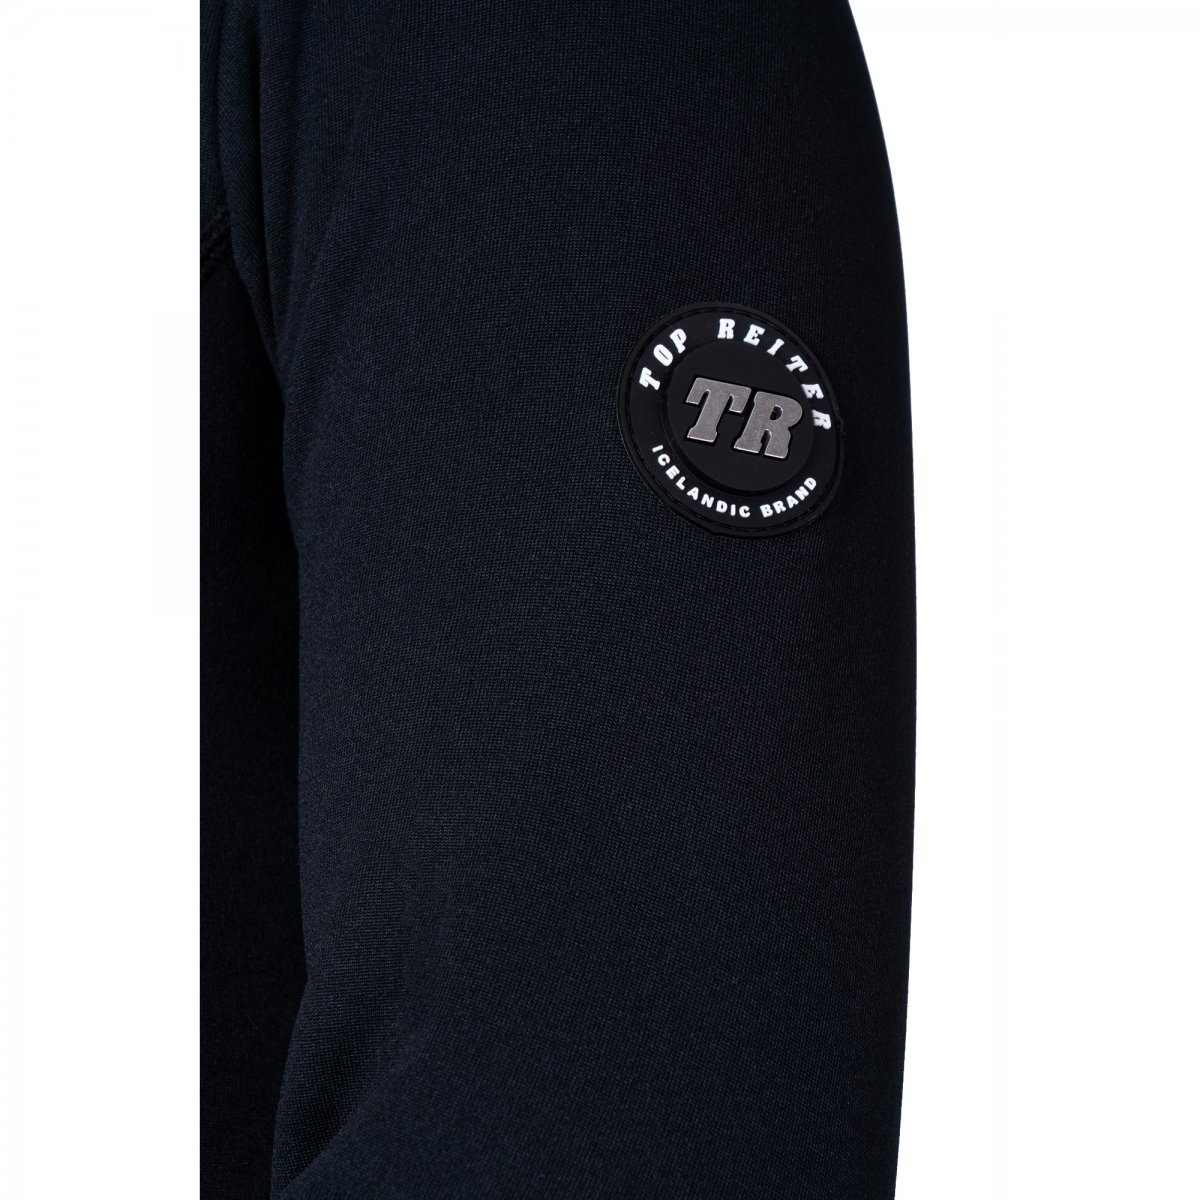 top-reiter-bylgja-troja-dam-svart-tr-knapp-vanster-arm